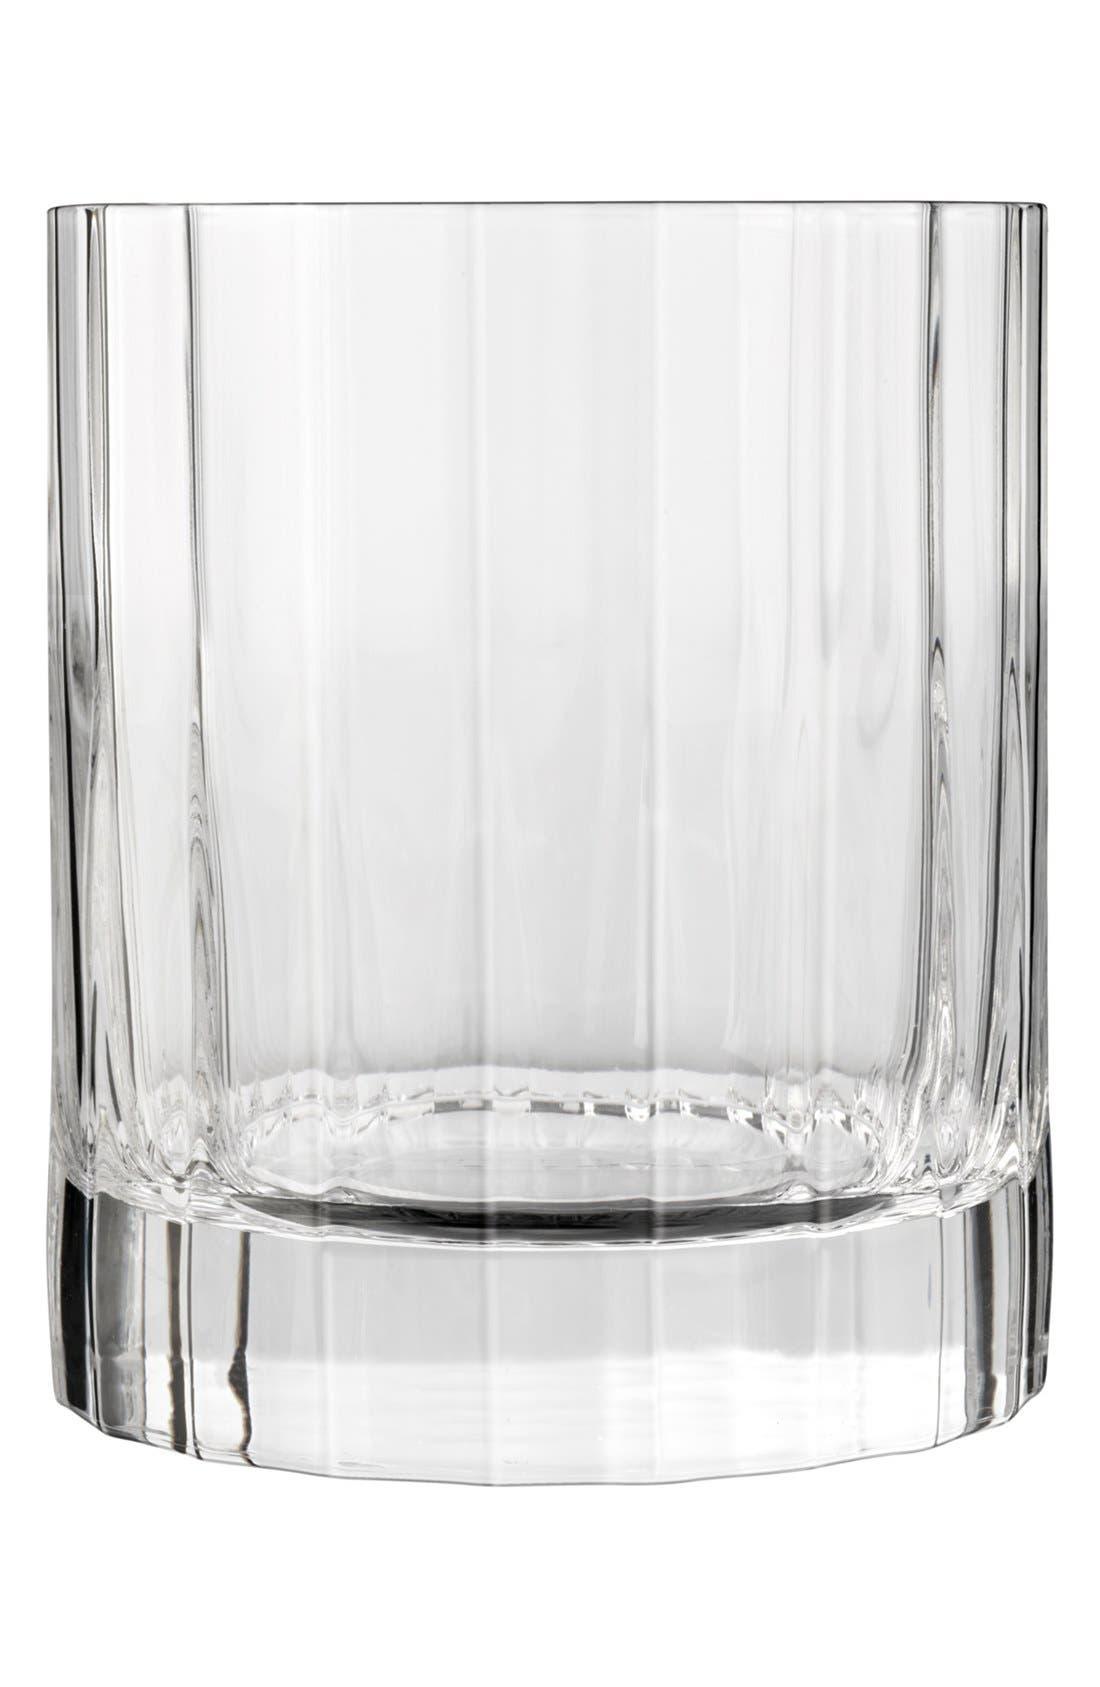 Main Image - Luigi Bormioli 'Bach' Double Old Fashioned Glasses (Set of 4)